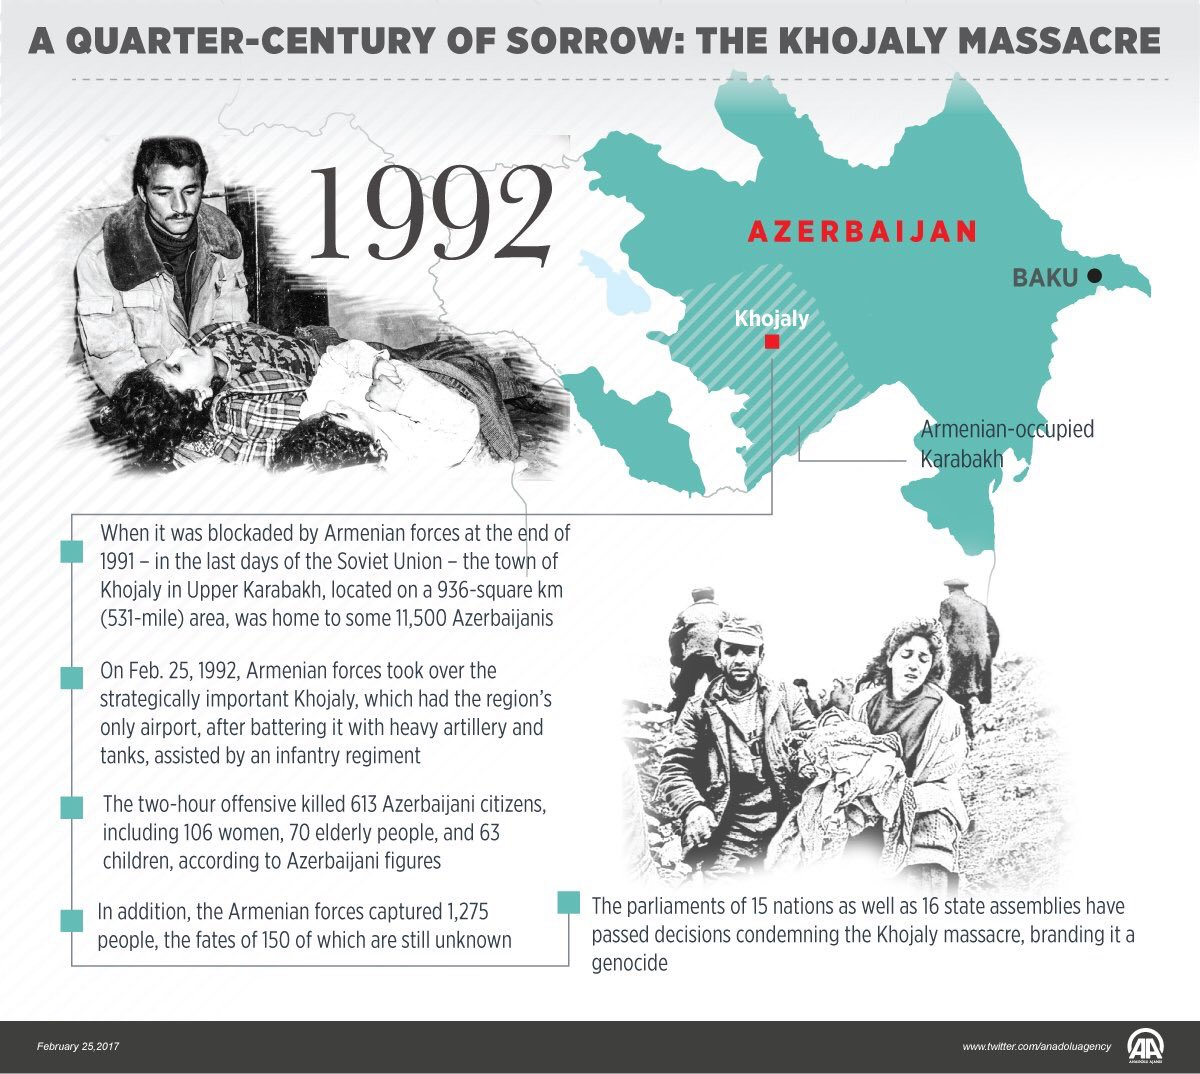 OIC Commemorates the 1992 Khojaly Massacre ile ilgili görsel sonucu